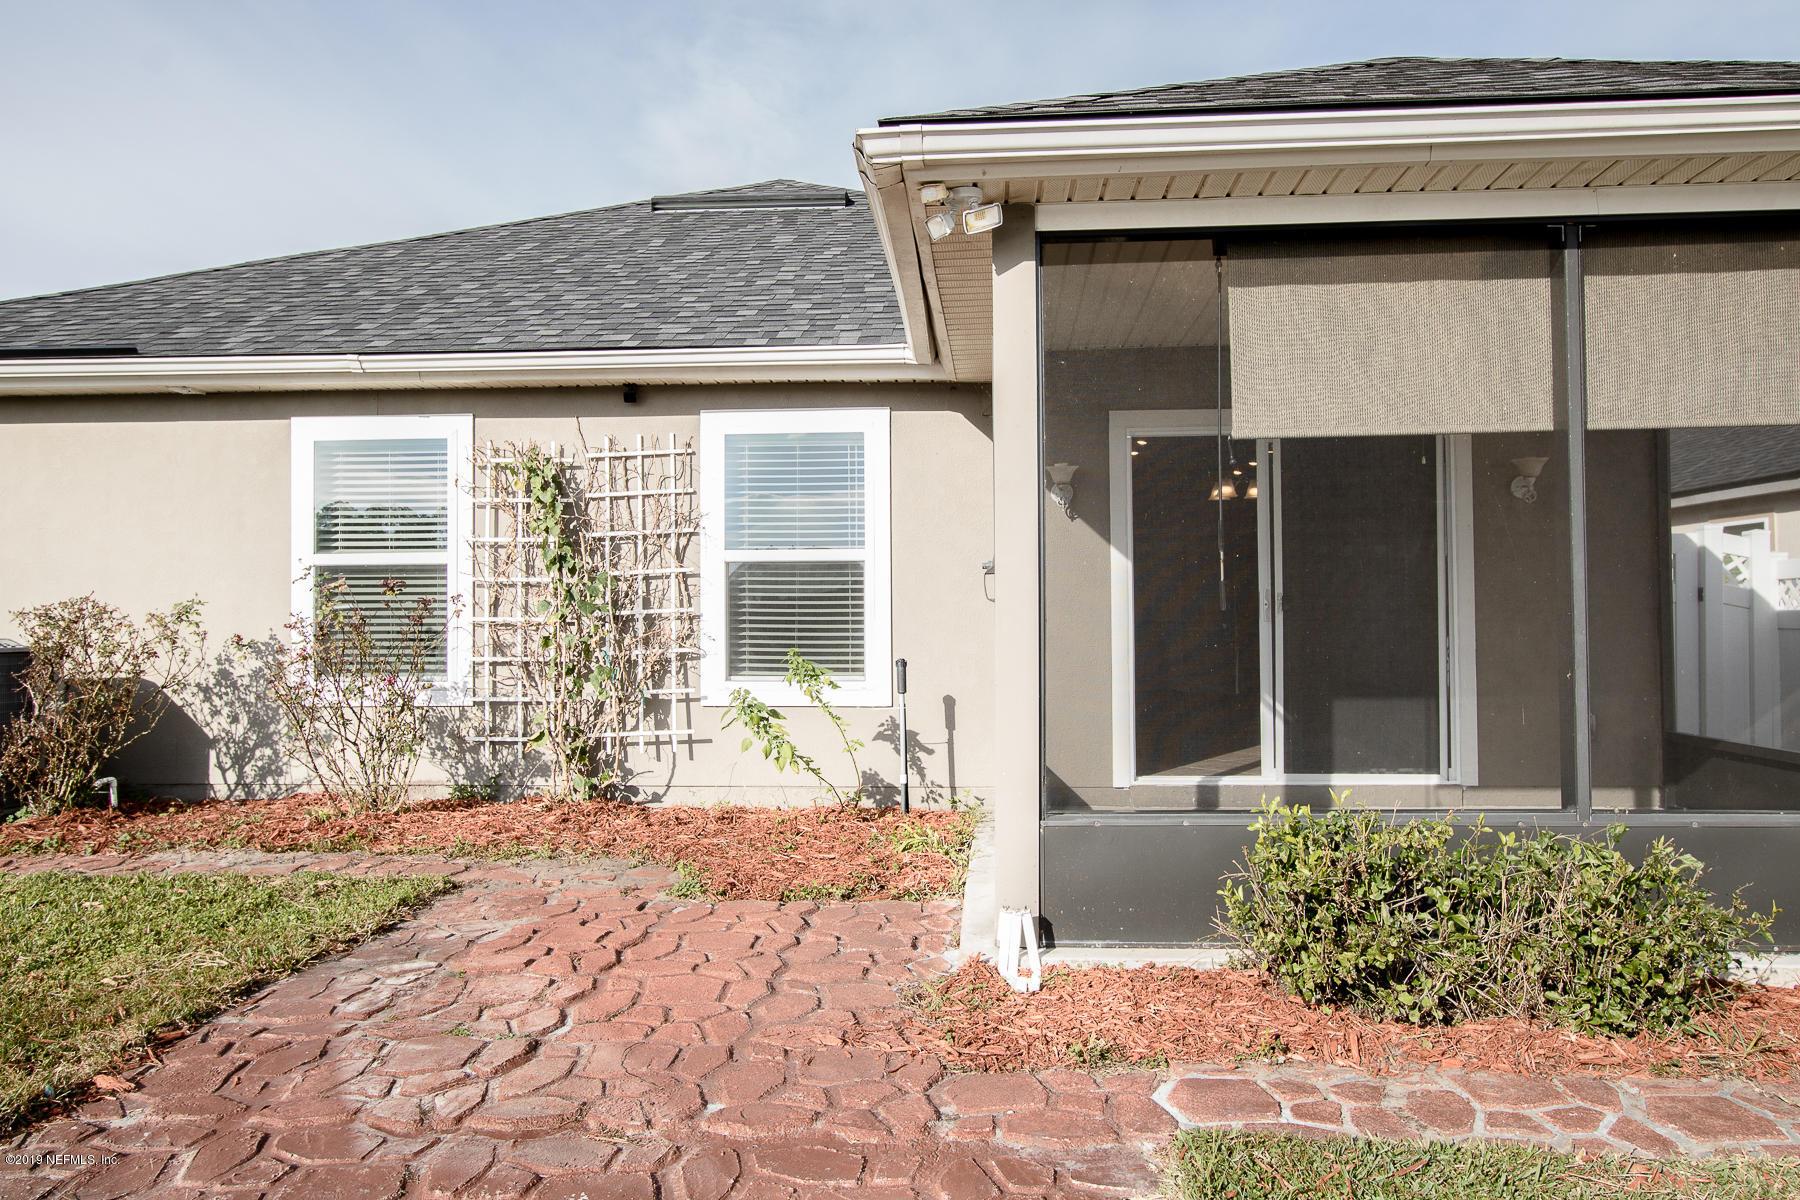 584 GLENDALE, ORANGE PARK, FLORIDA 32065, 4 Bedrooms Bedrooms, ,2 BathroomsBathrooms,Residential - single family,For sale,GLENDALE,972575